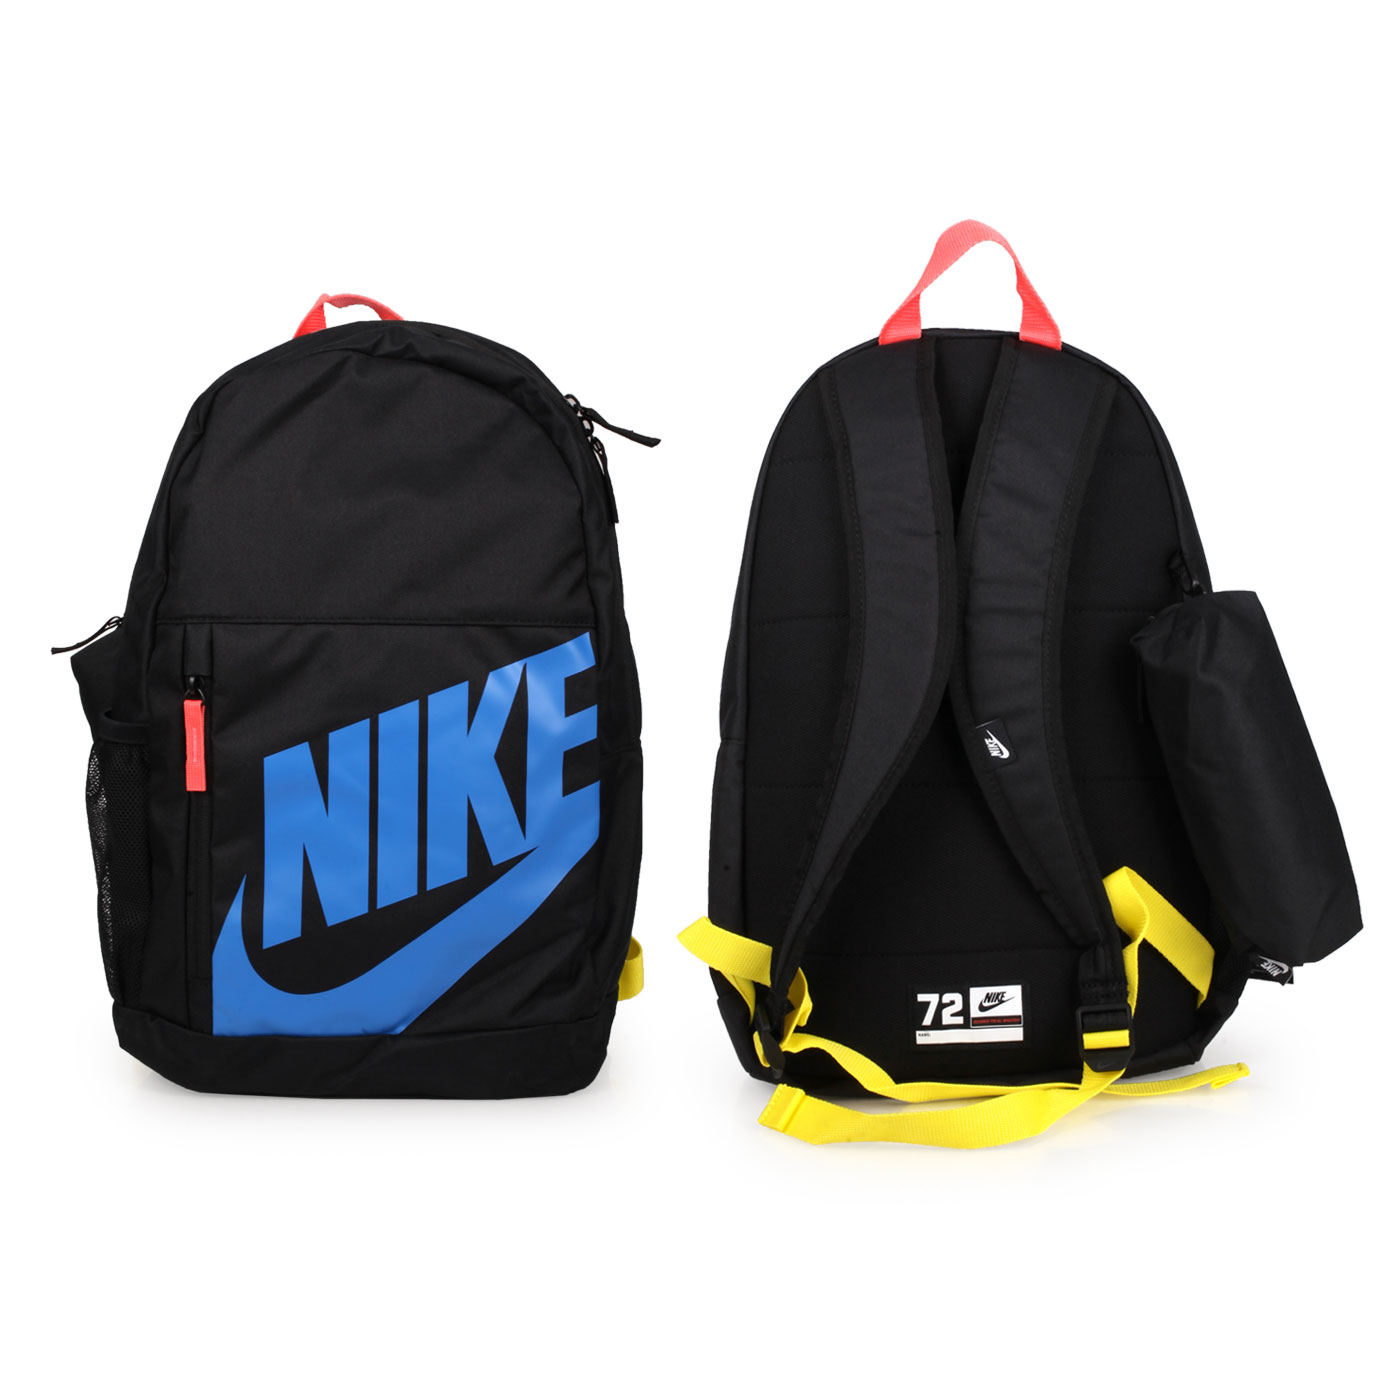 NIKE 中型後背包 BA6030-013 - 黑藍